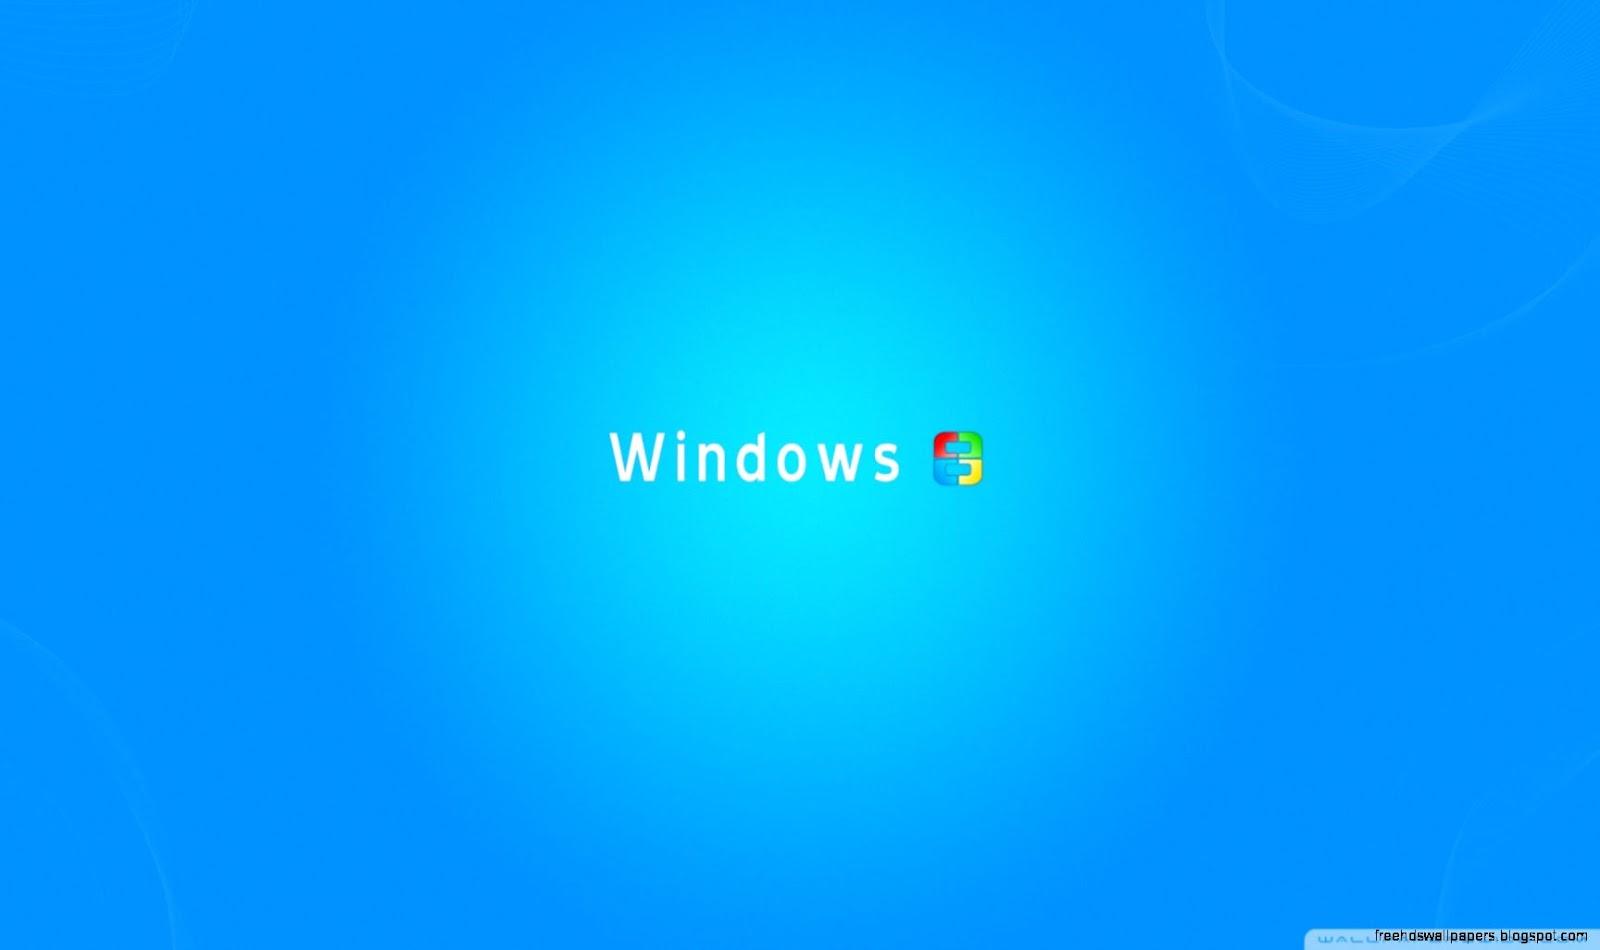 Windows 8 Wallpaper 1920X1080